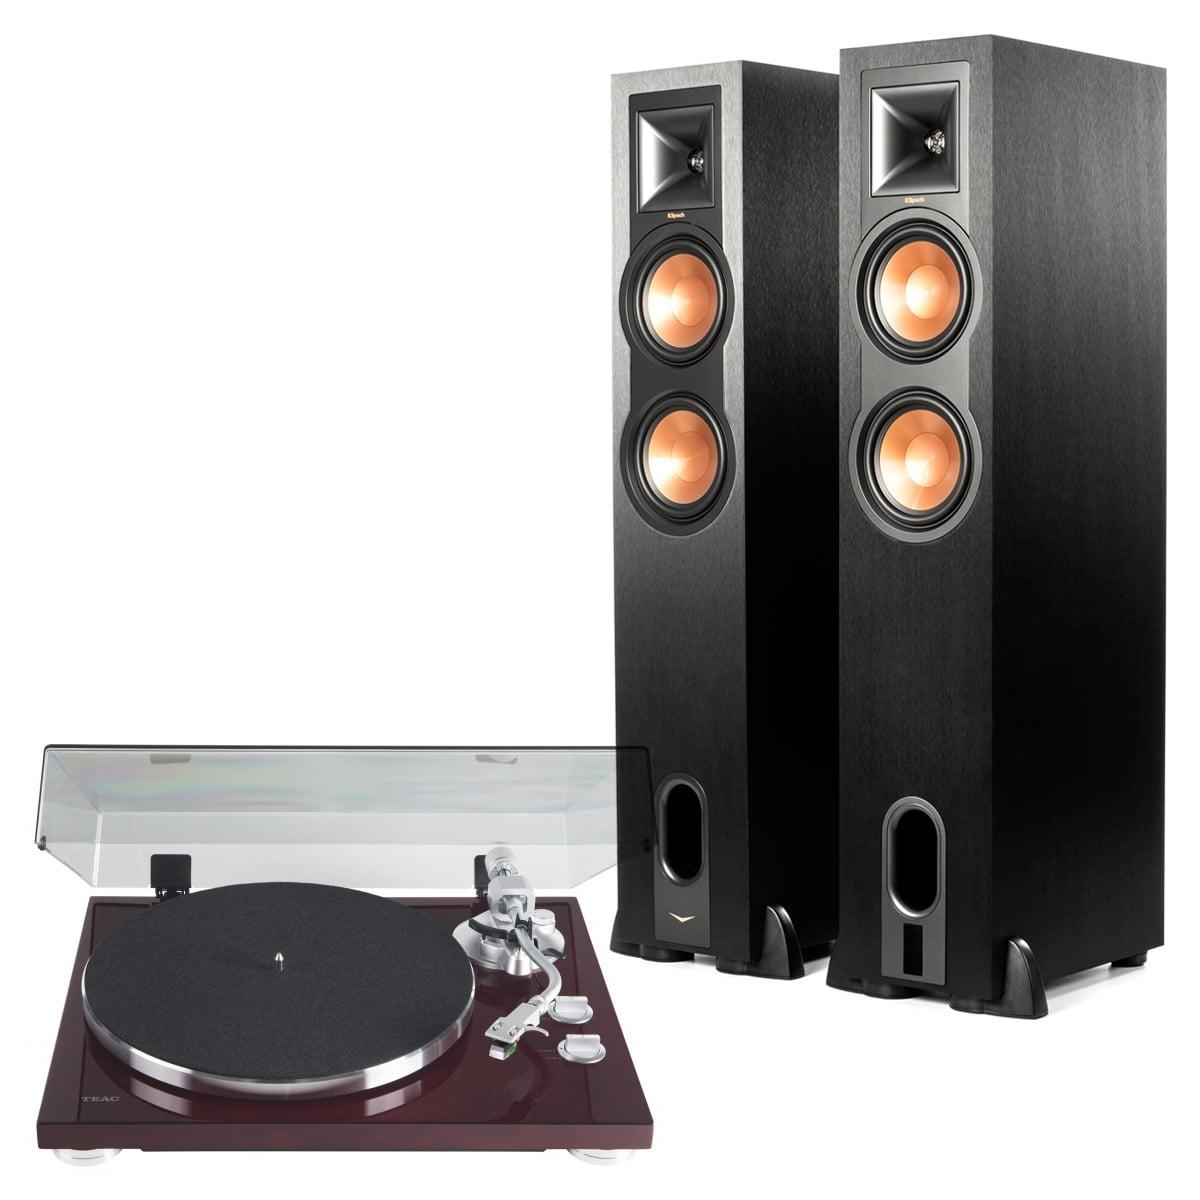 Klipsch R-26PF Powered Floorstanding Speakers with Teac TN-400S Turntable by Klipsch